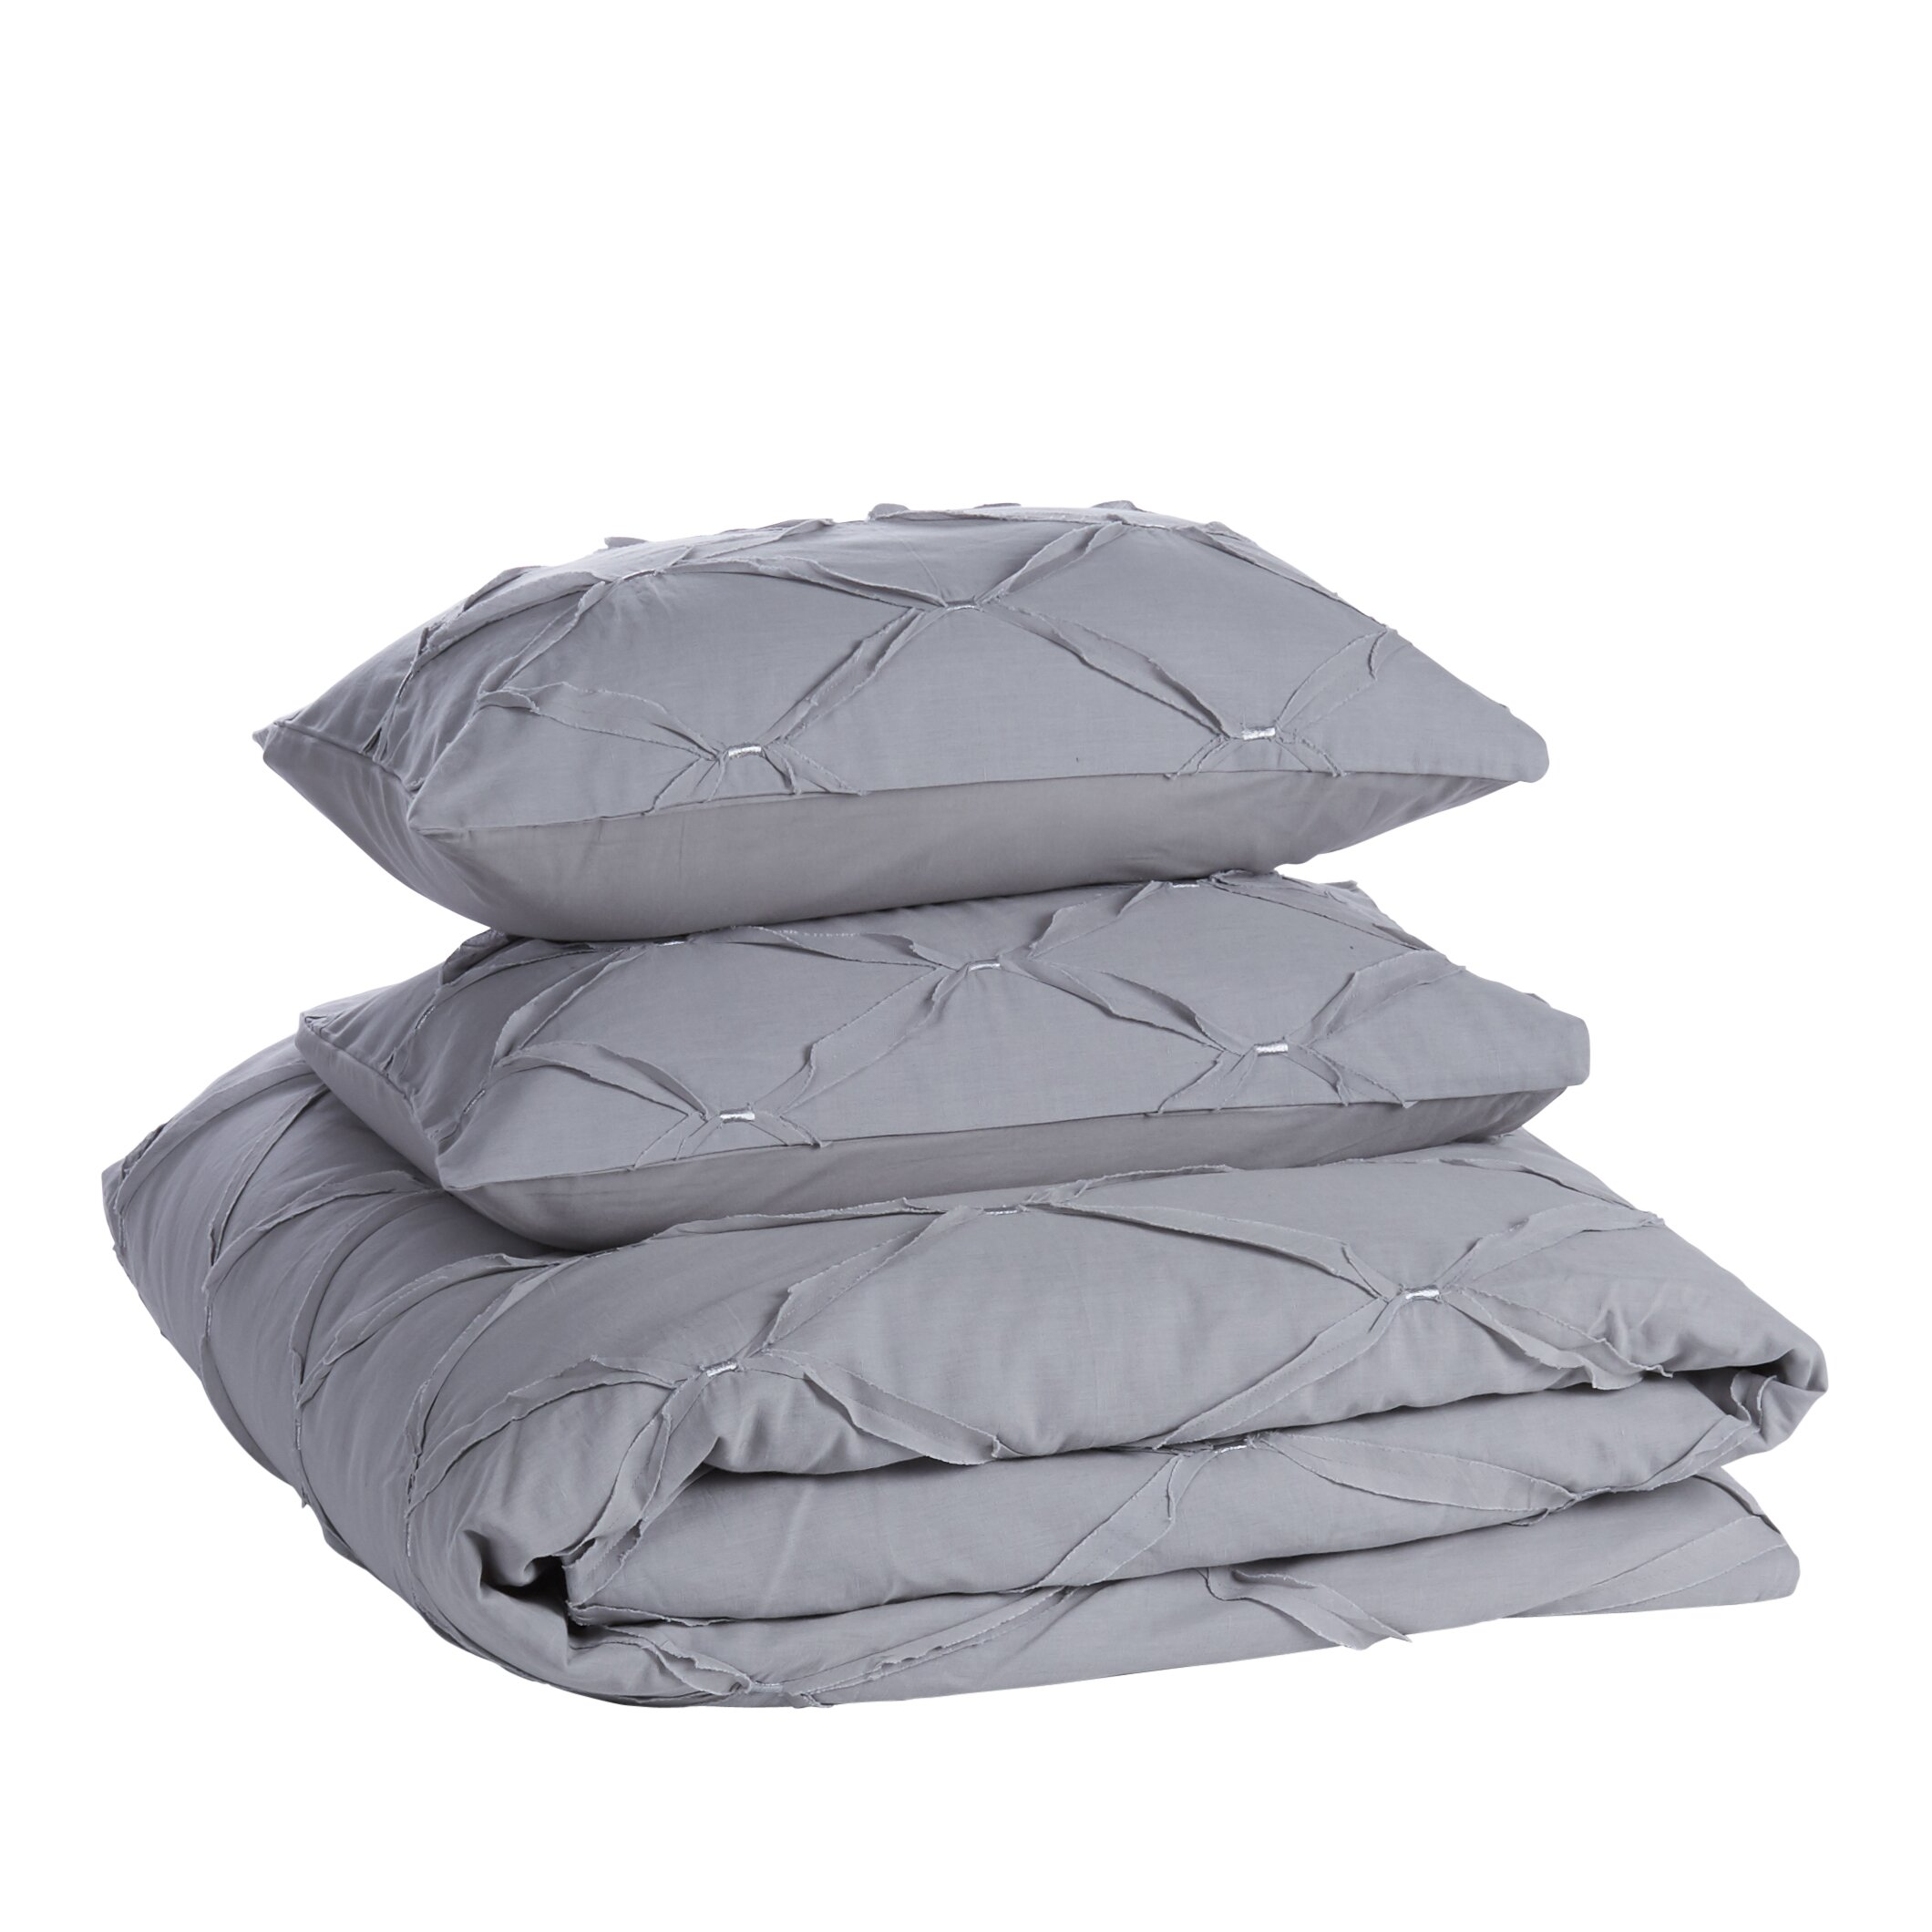 House of hampton selma duvet cover set reviews wayfair for House of hampton bedding